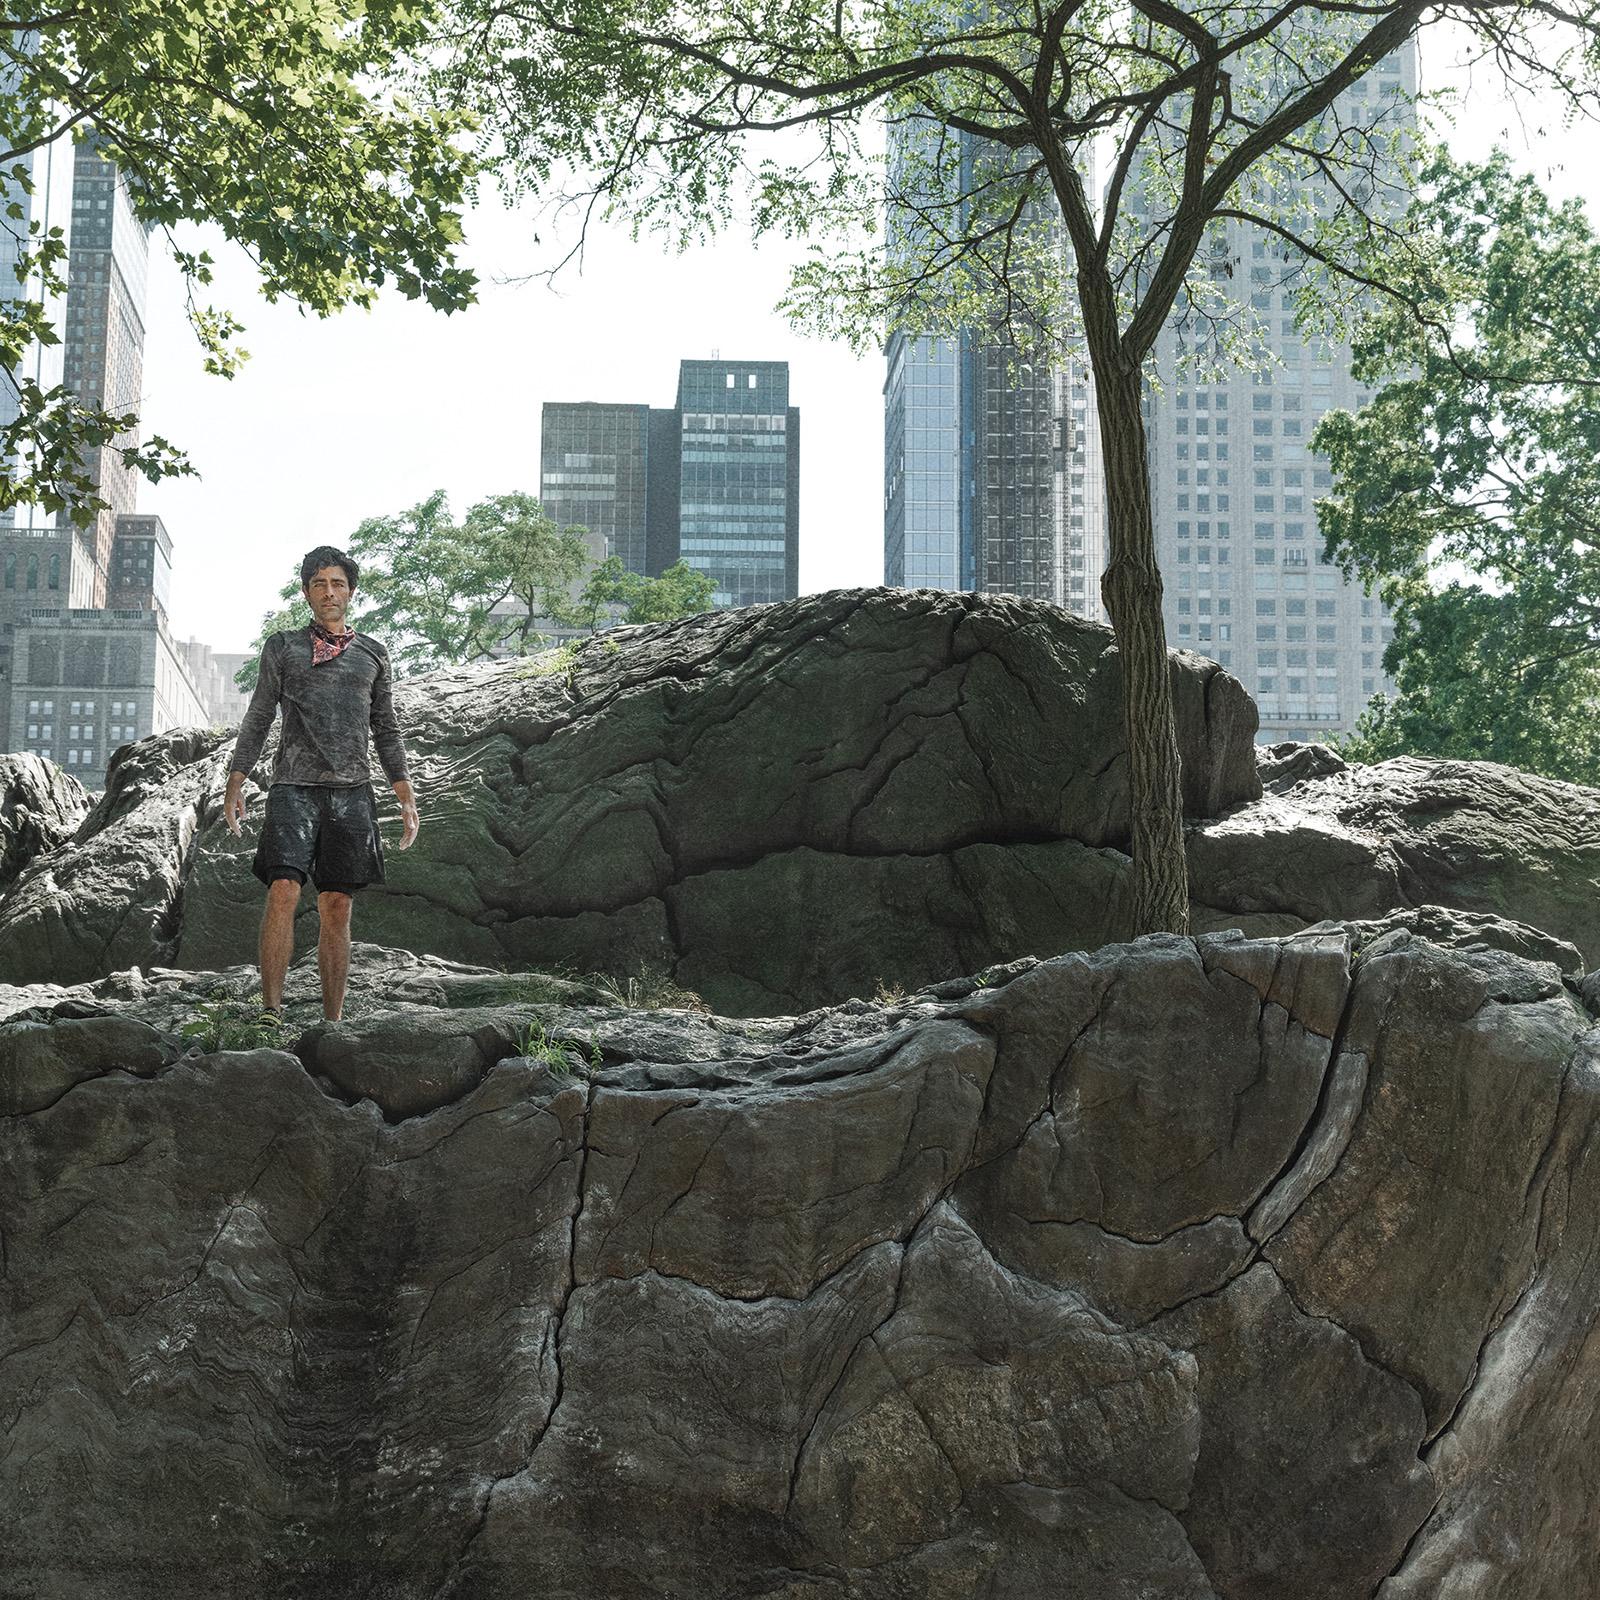 Adrian Grenier standing on a rock